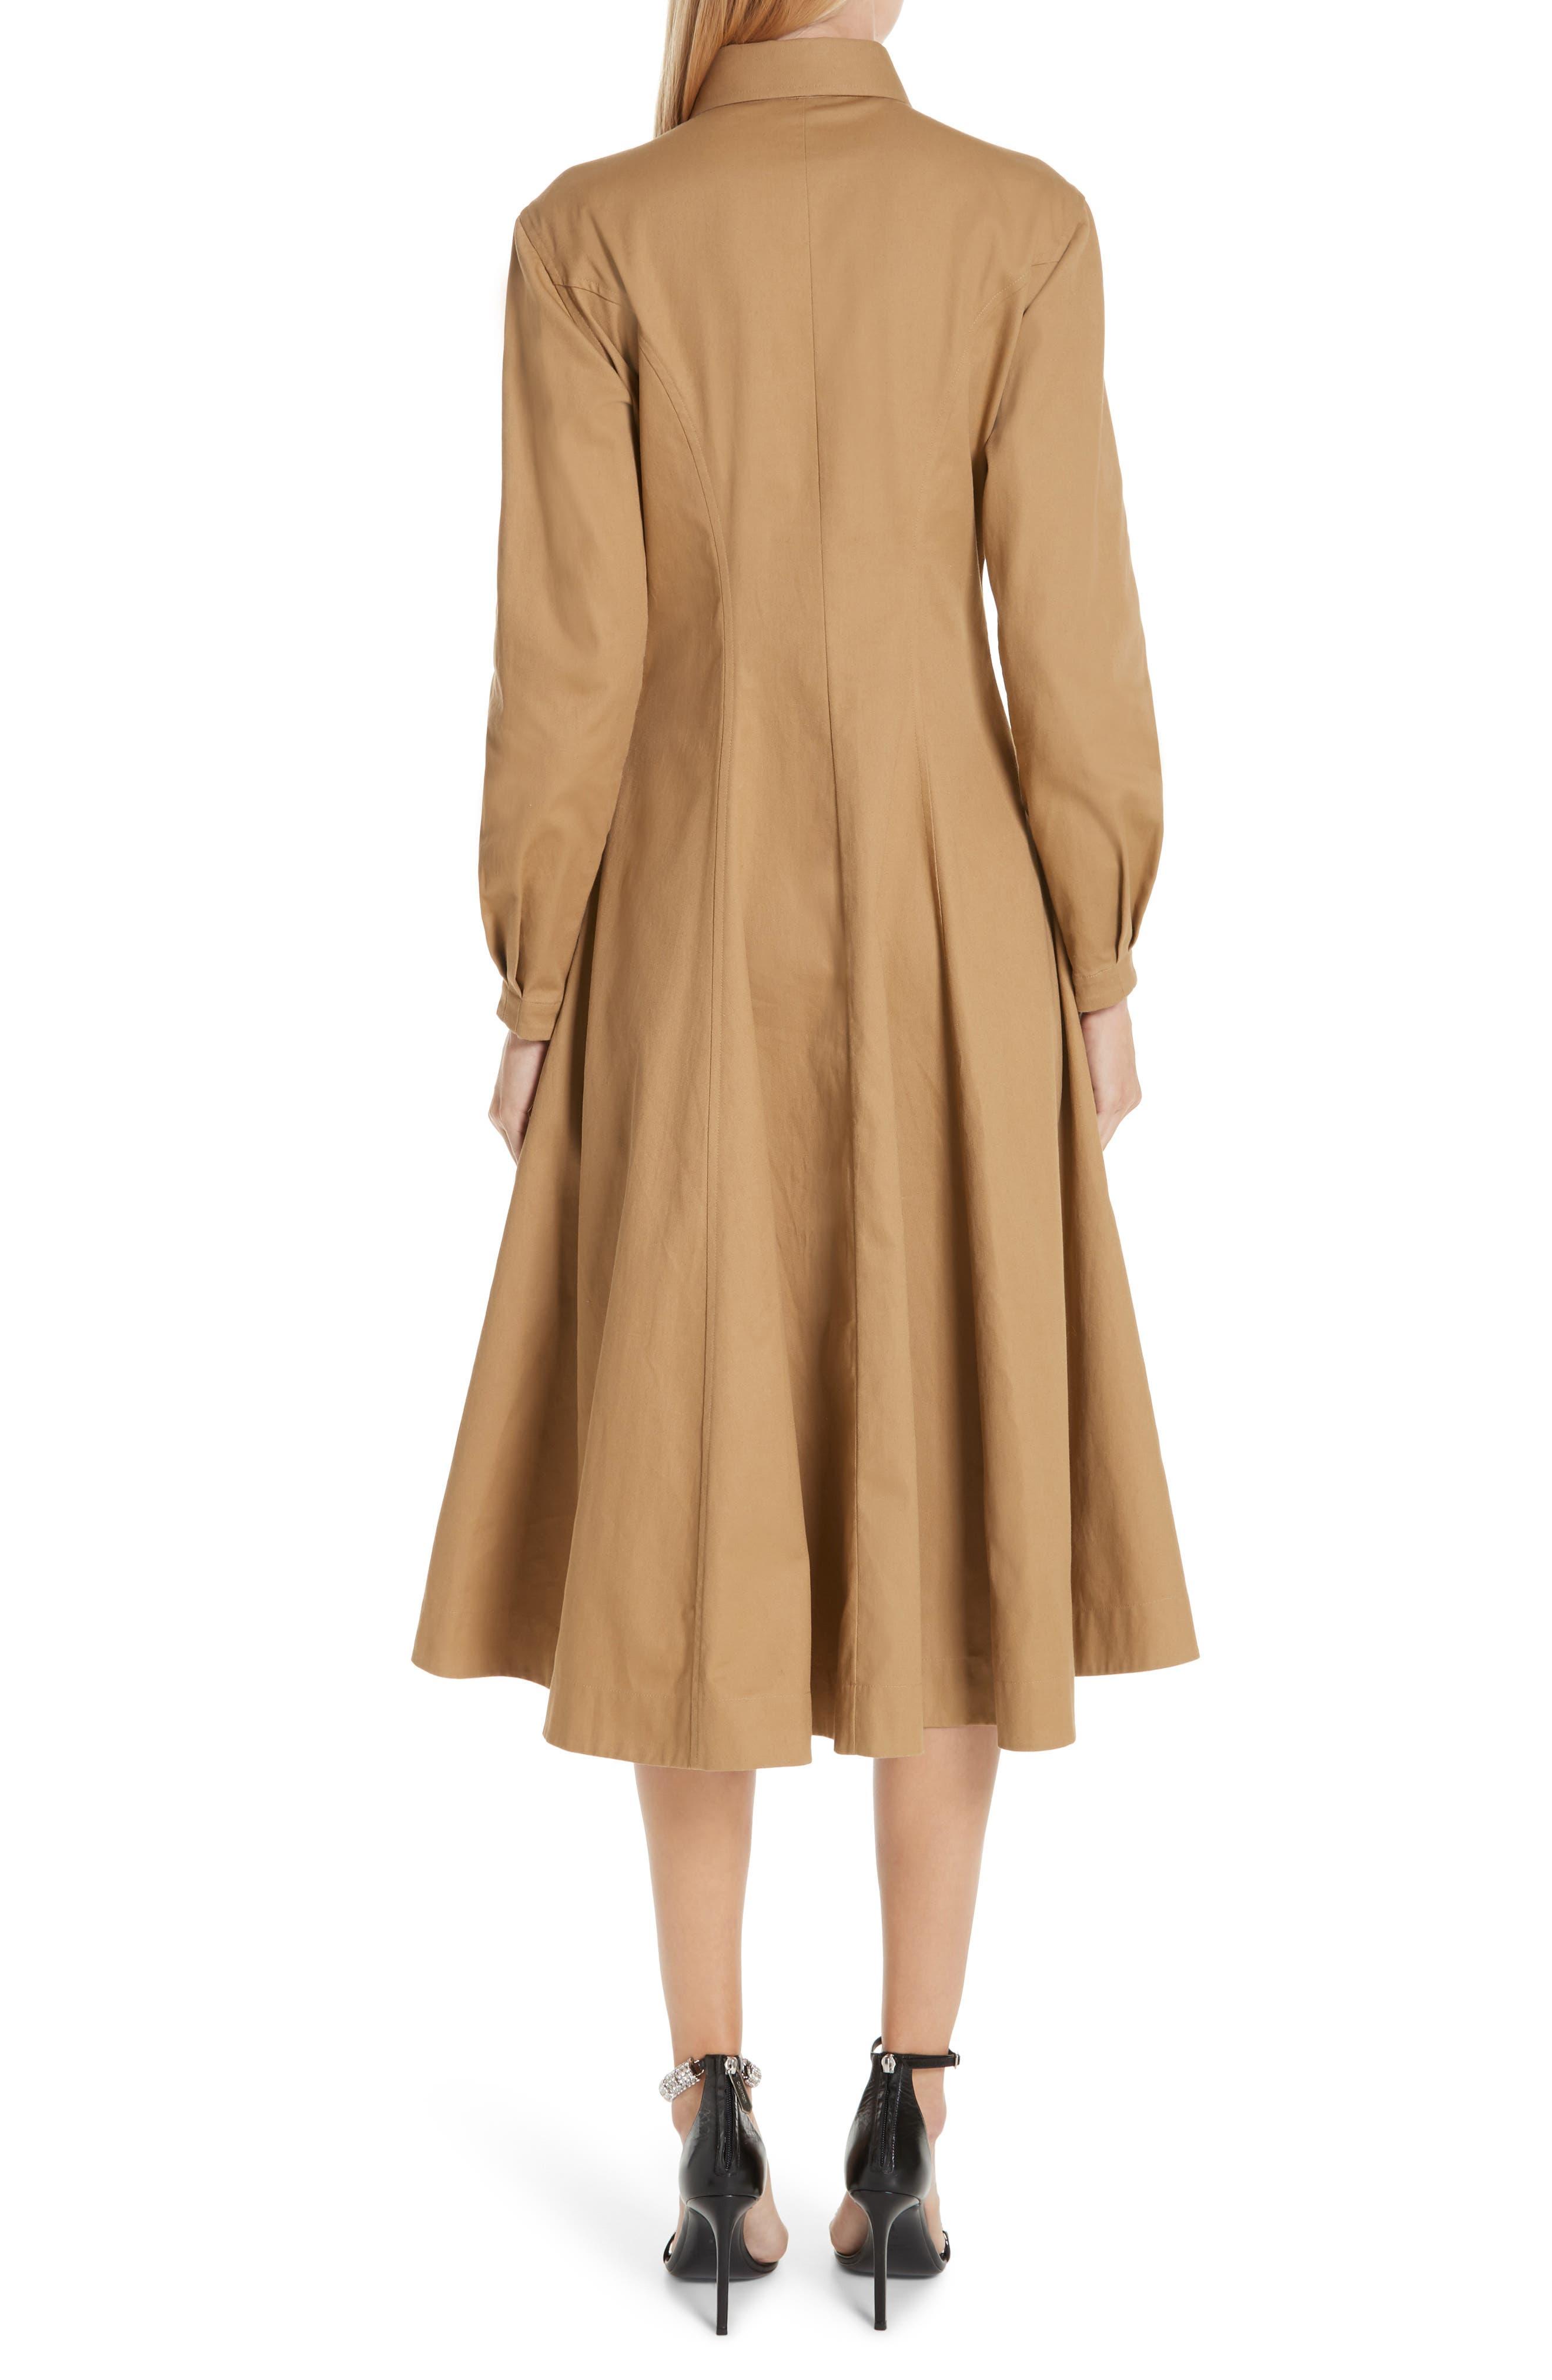 CALVIN KLEIN 205W39NYC, Western Twill A-Line Midi Dress, Alternate thumbnail 2, color, DUNE